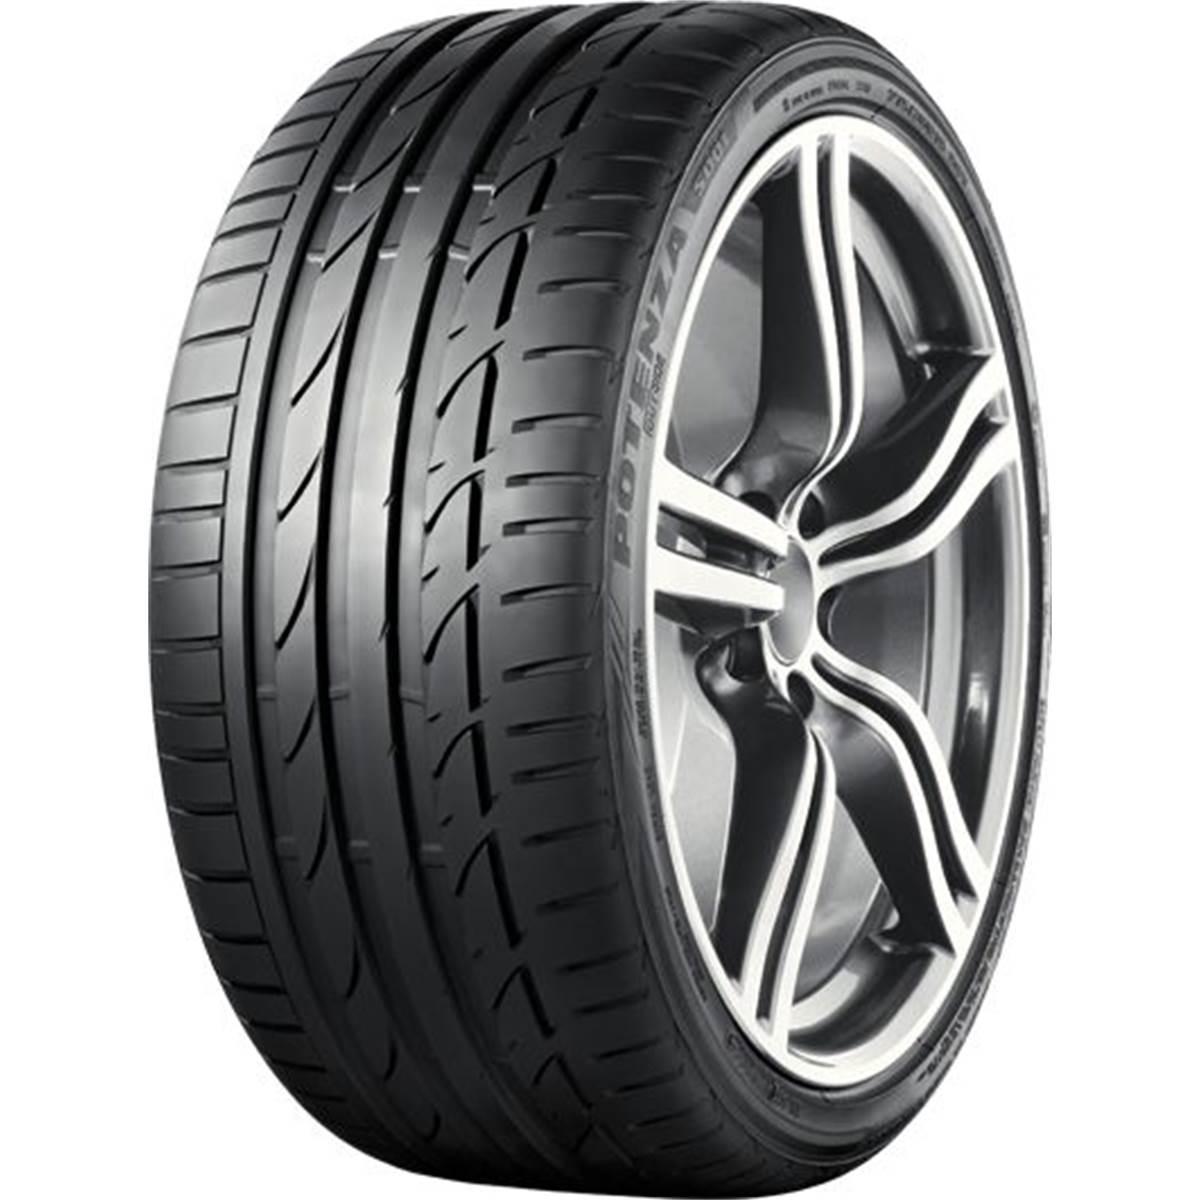 Pneu Bridgestone 235/50R18 97V Potenza S001